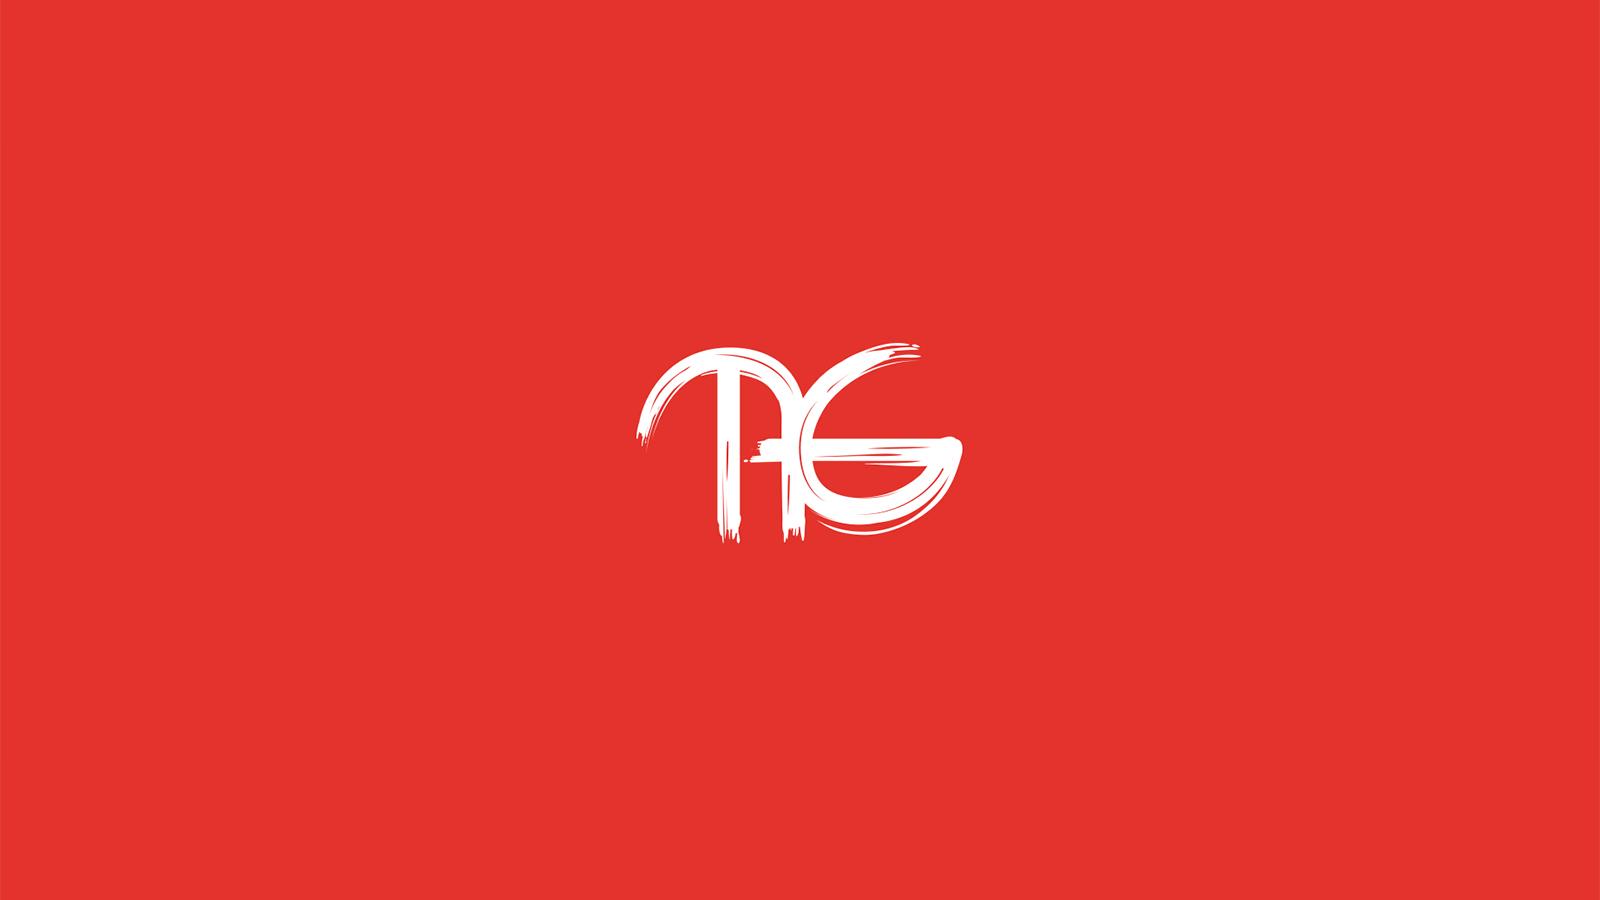 Logo design startup venture capital עיצוב לוגו סטארטאפ קרן הון סיכון